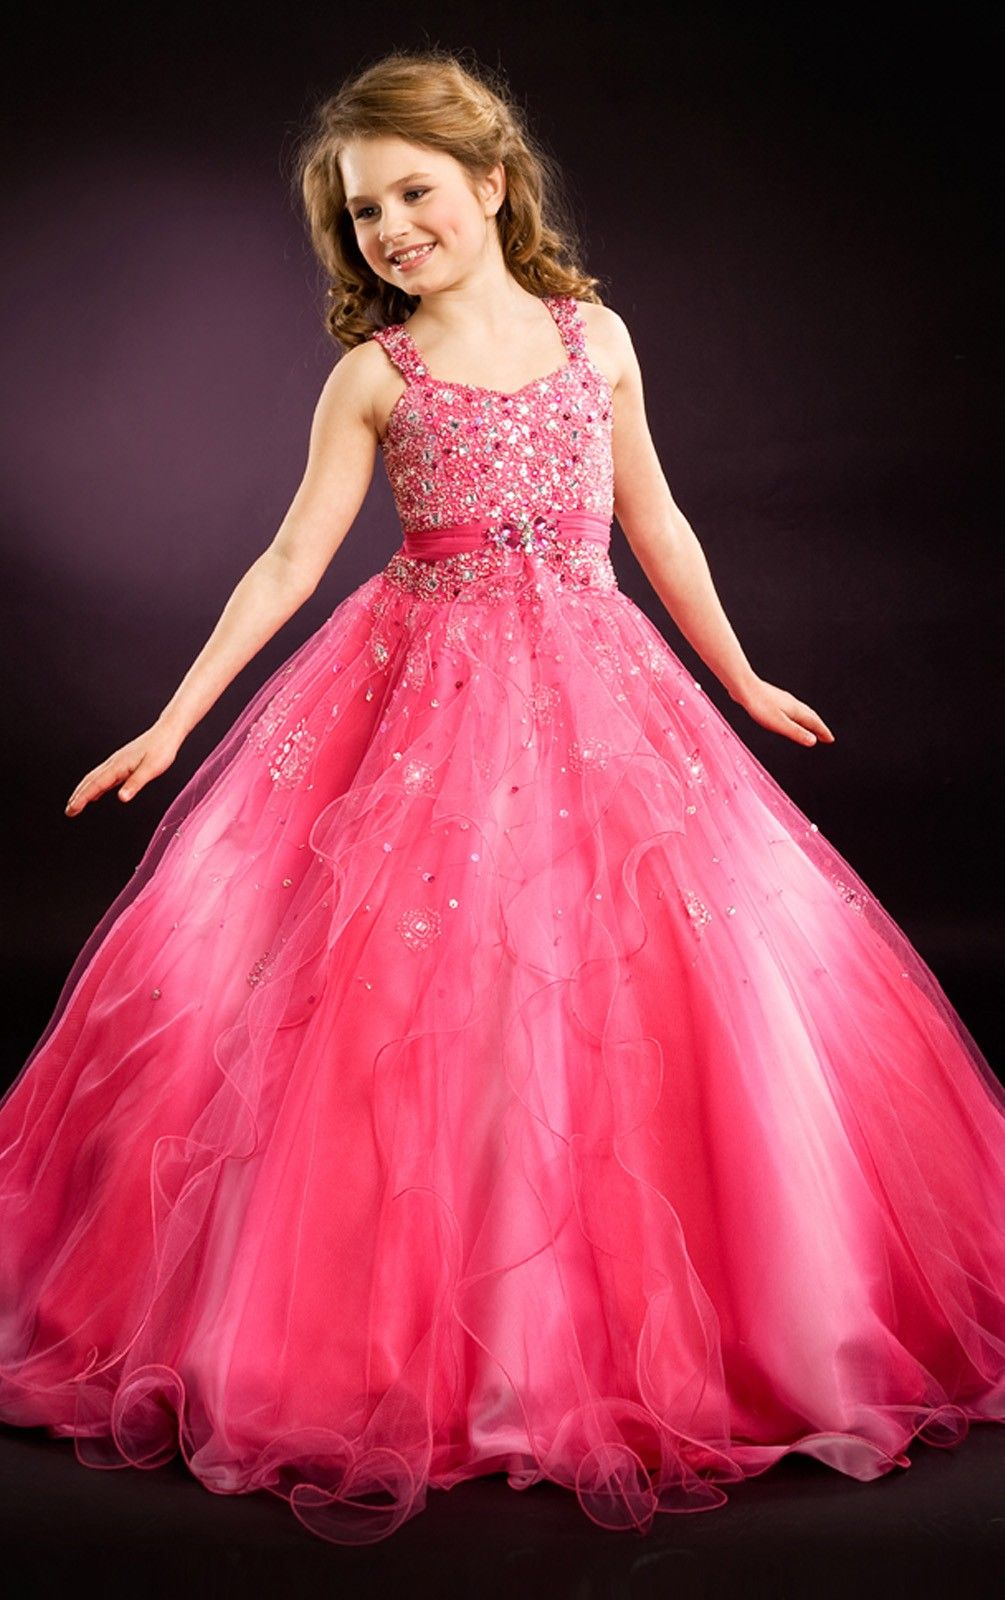 Princess kids prom Dress Dressesonlineshops.co.uk   I love ti ...